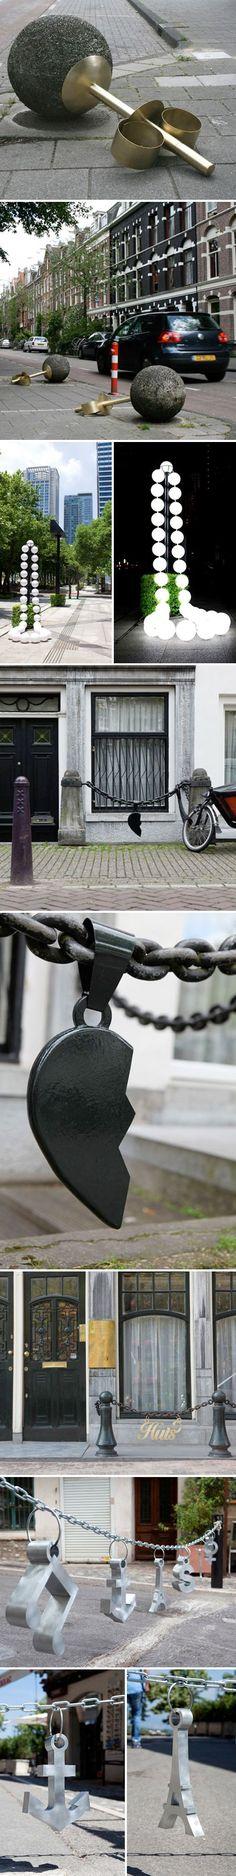 Liesbet Bussche - urban jewelry amsterdam